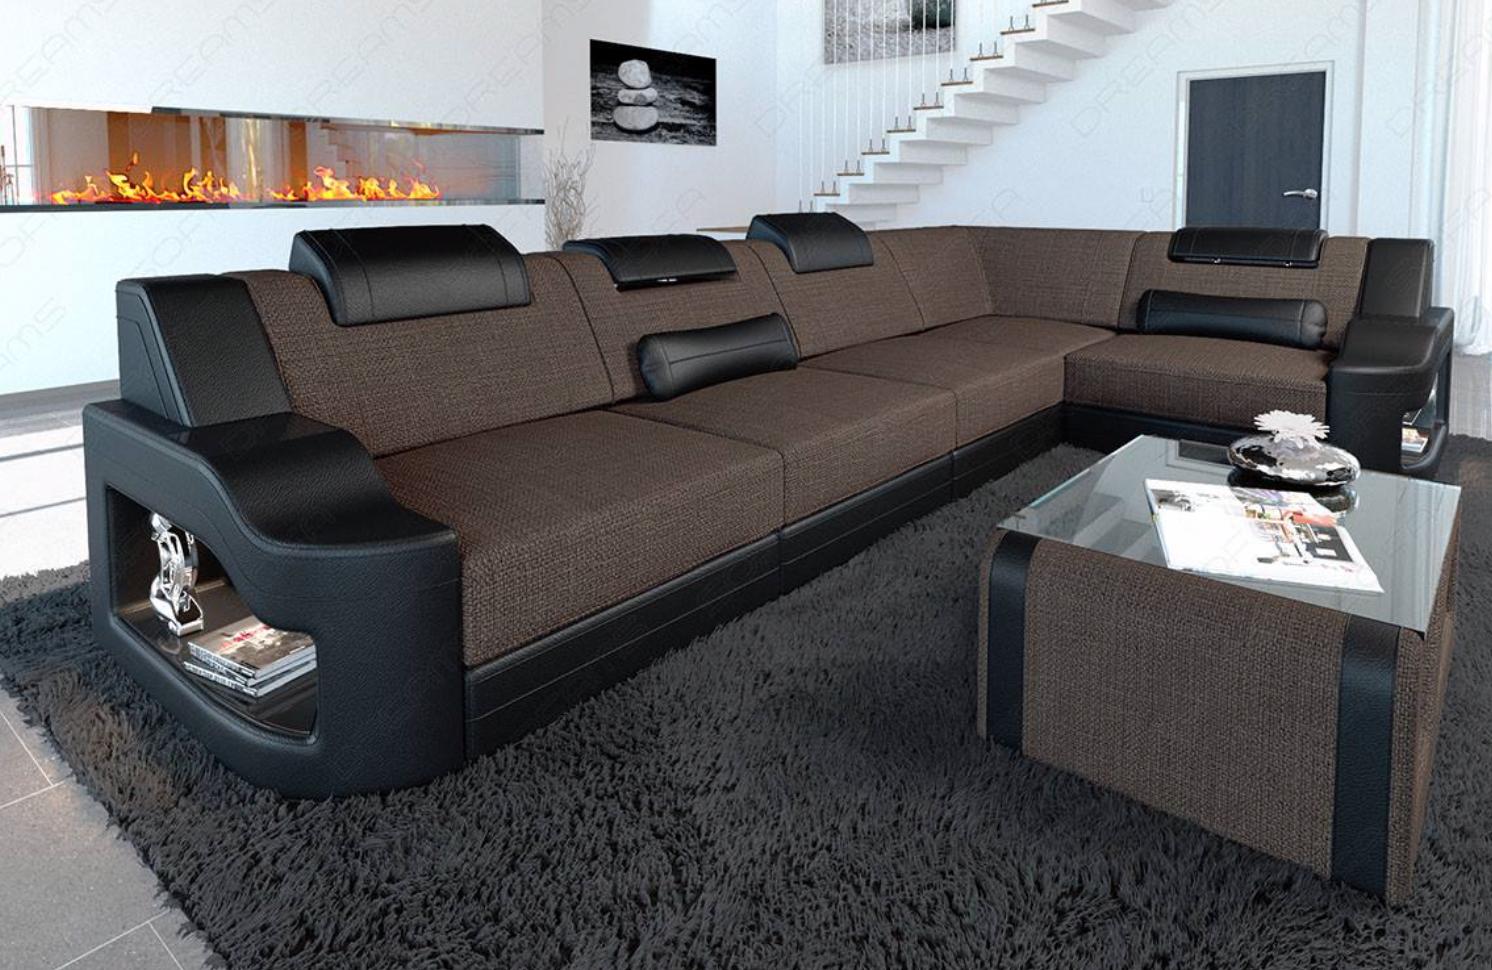 Fabric Corner Sofa Manhattan Luxury Sofa Design Living Room Sofa Design Modern Sofa Living Room